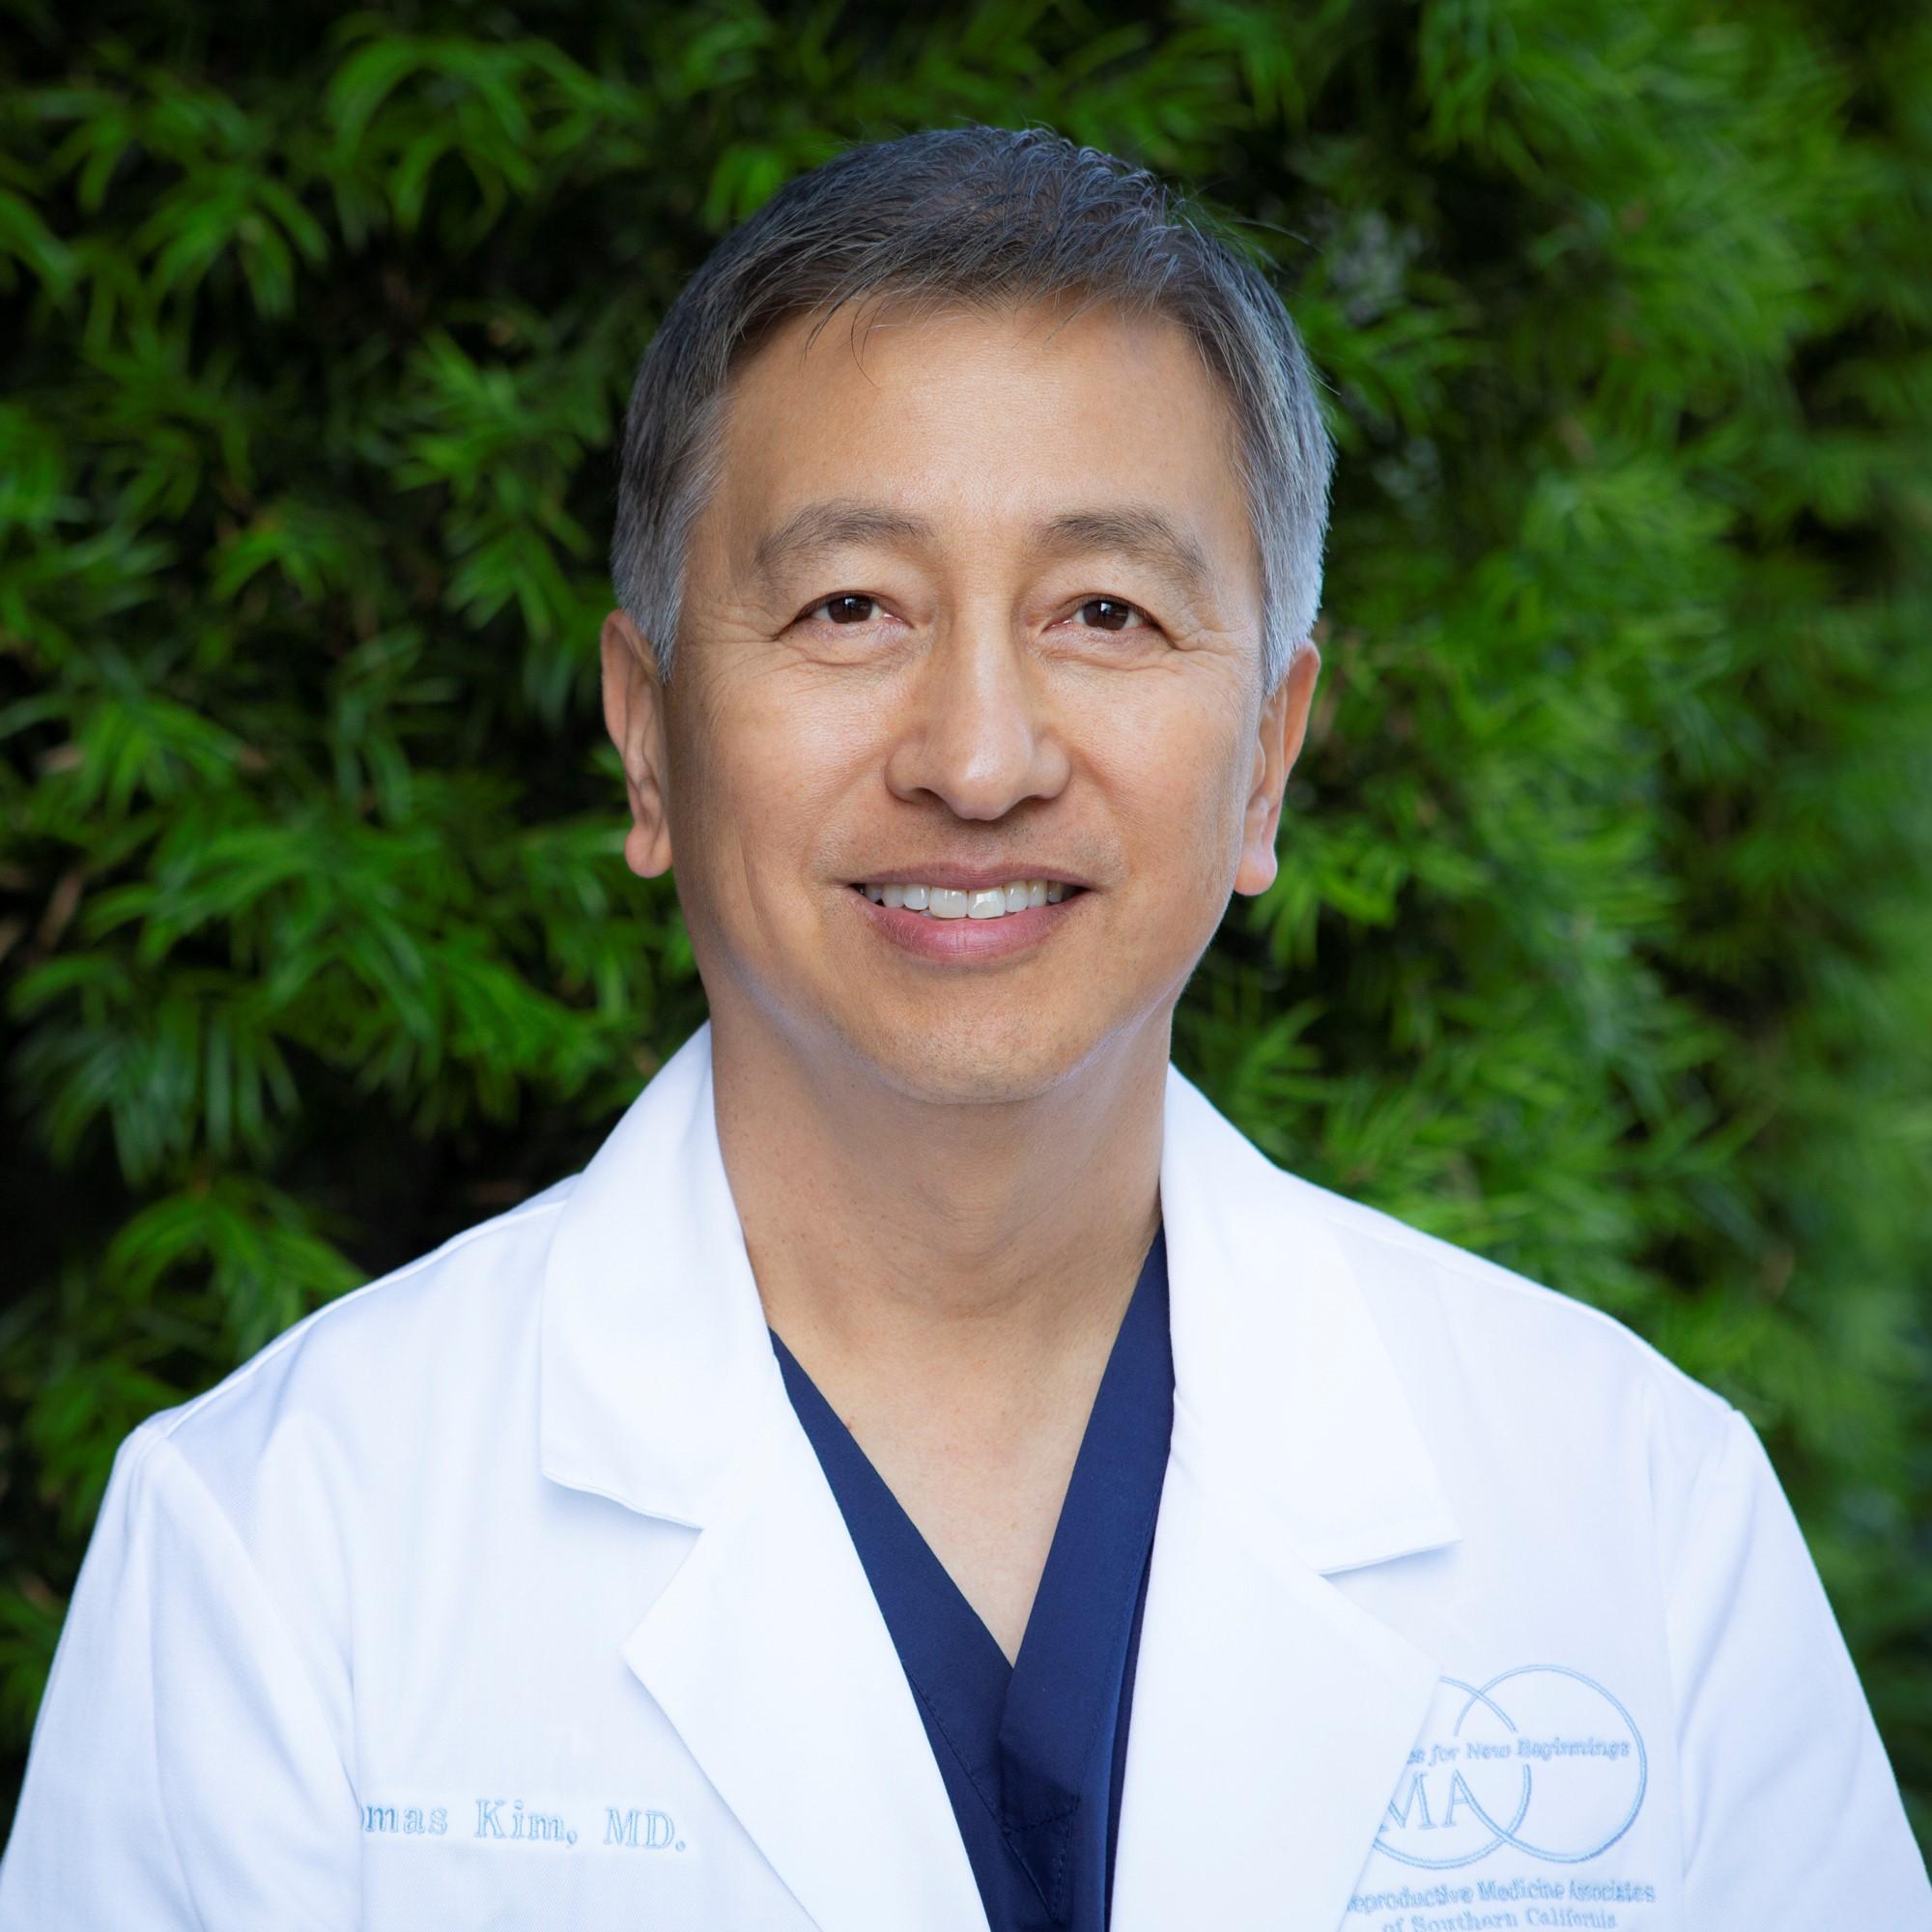 Dr. Thomas Kim